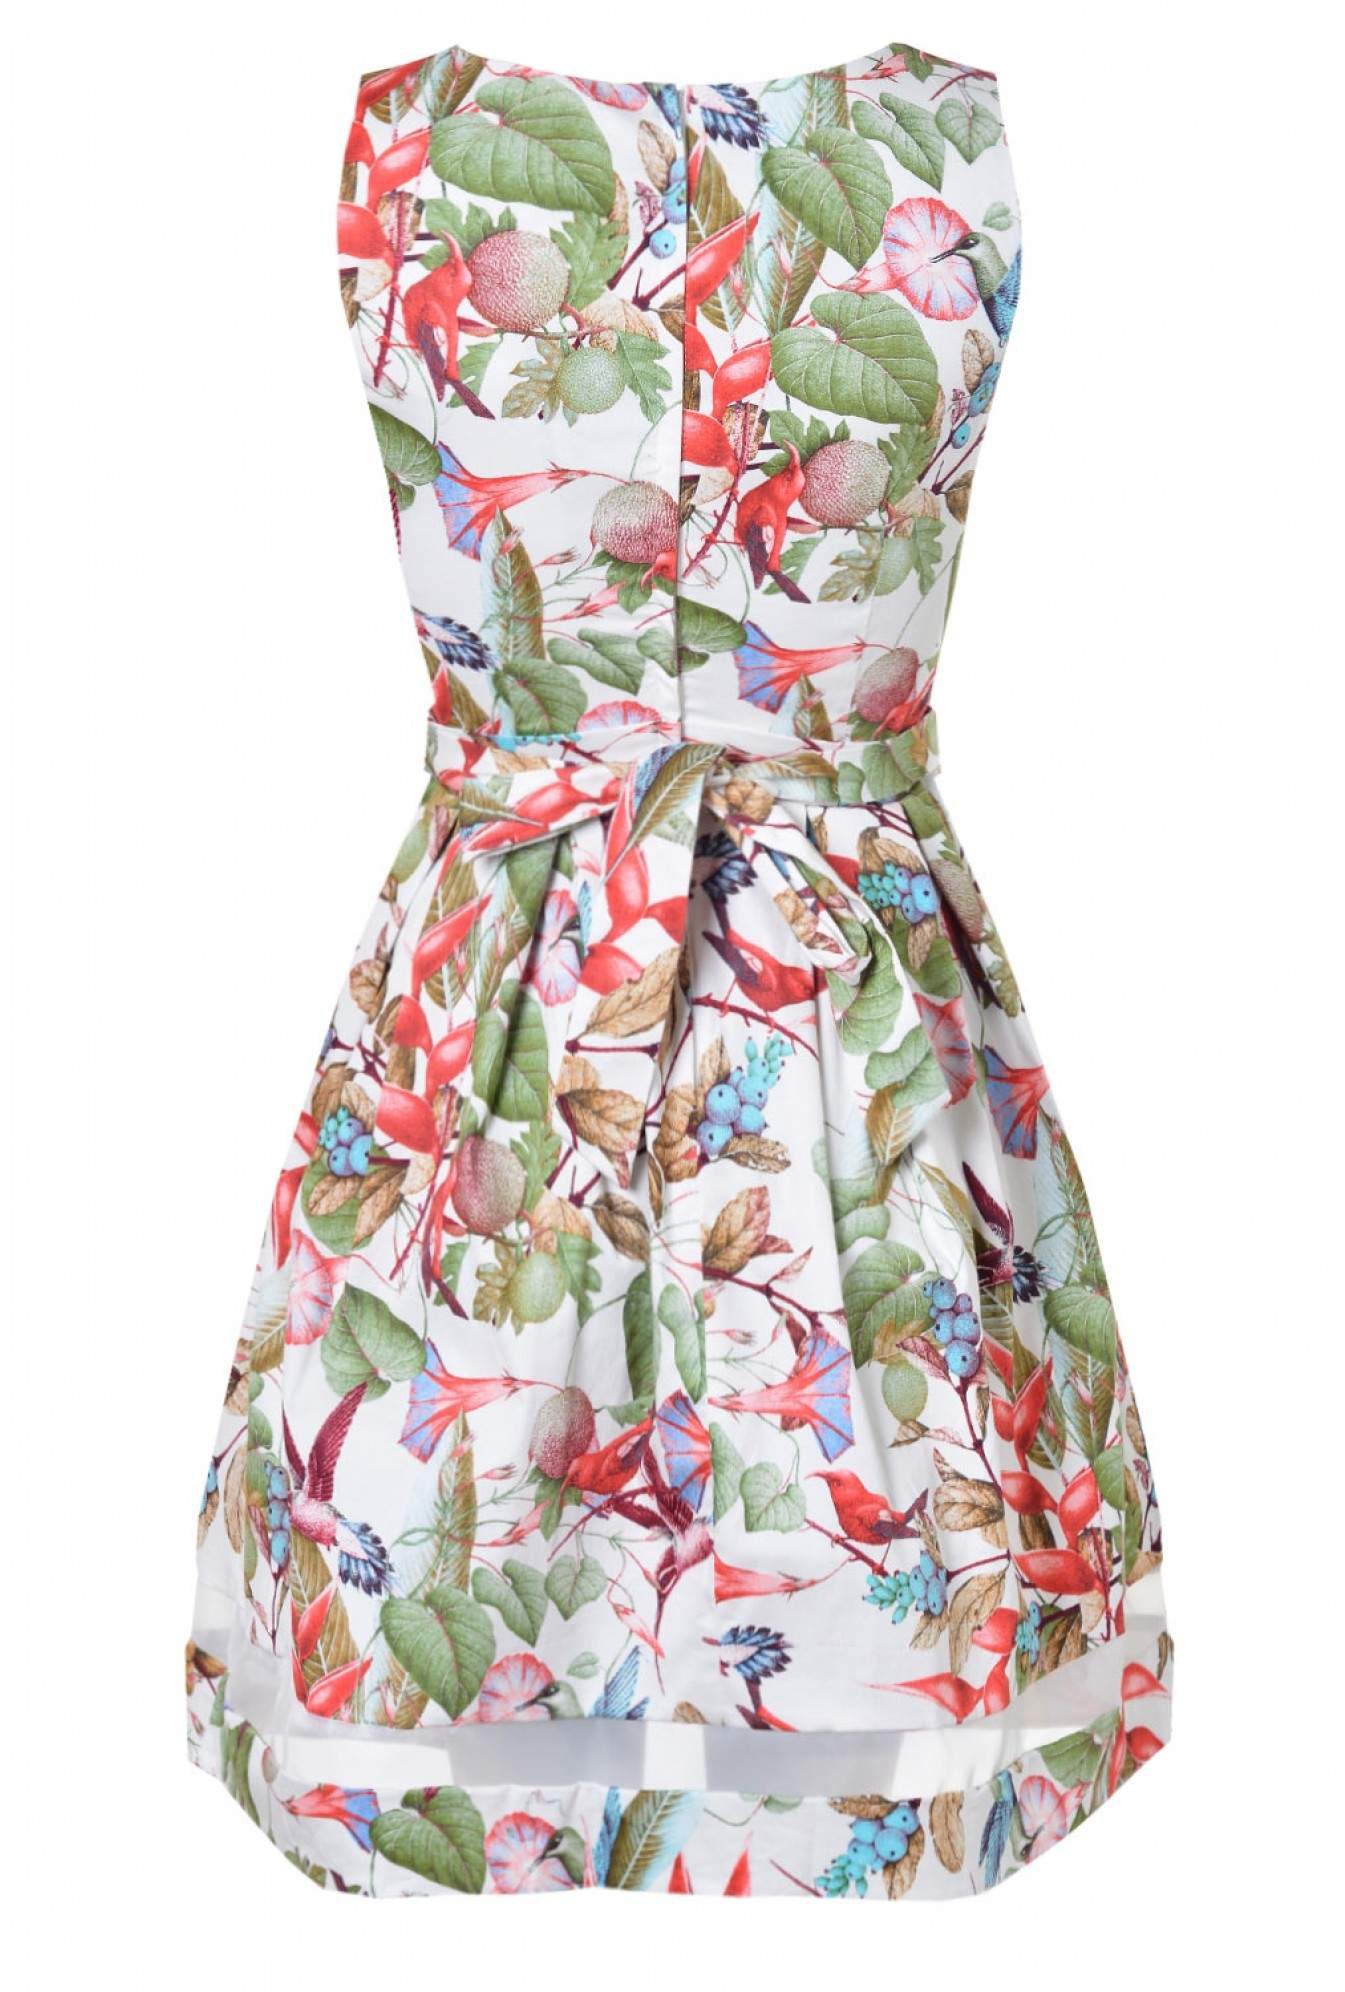 More Views. Vera Printed Skater Dress in Multi White 264999978